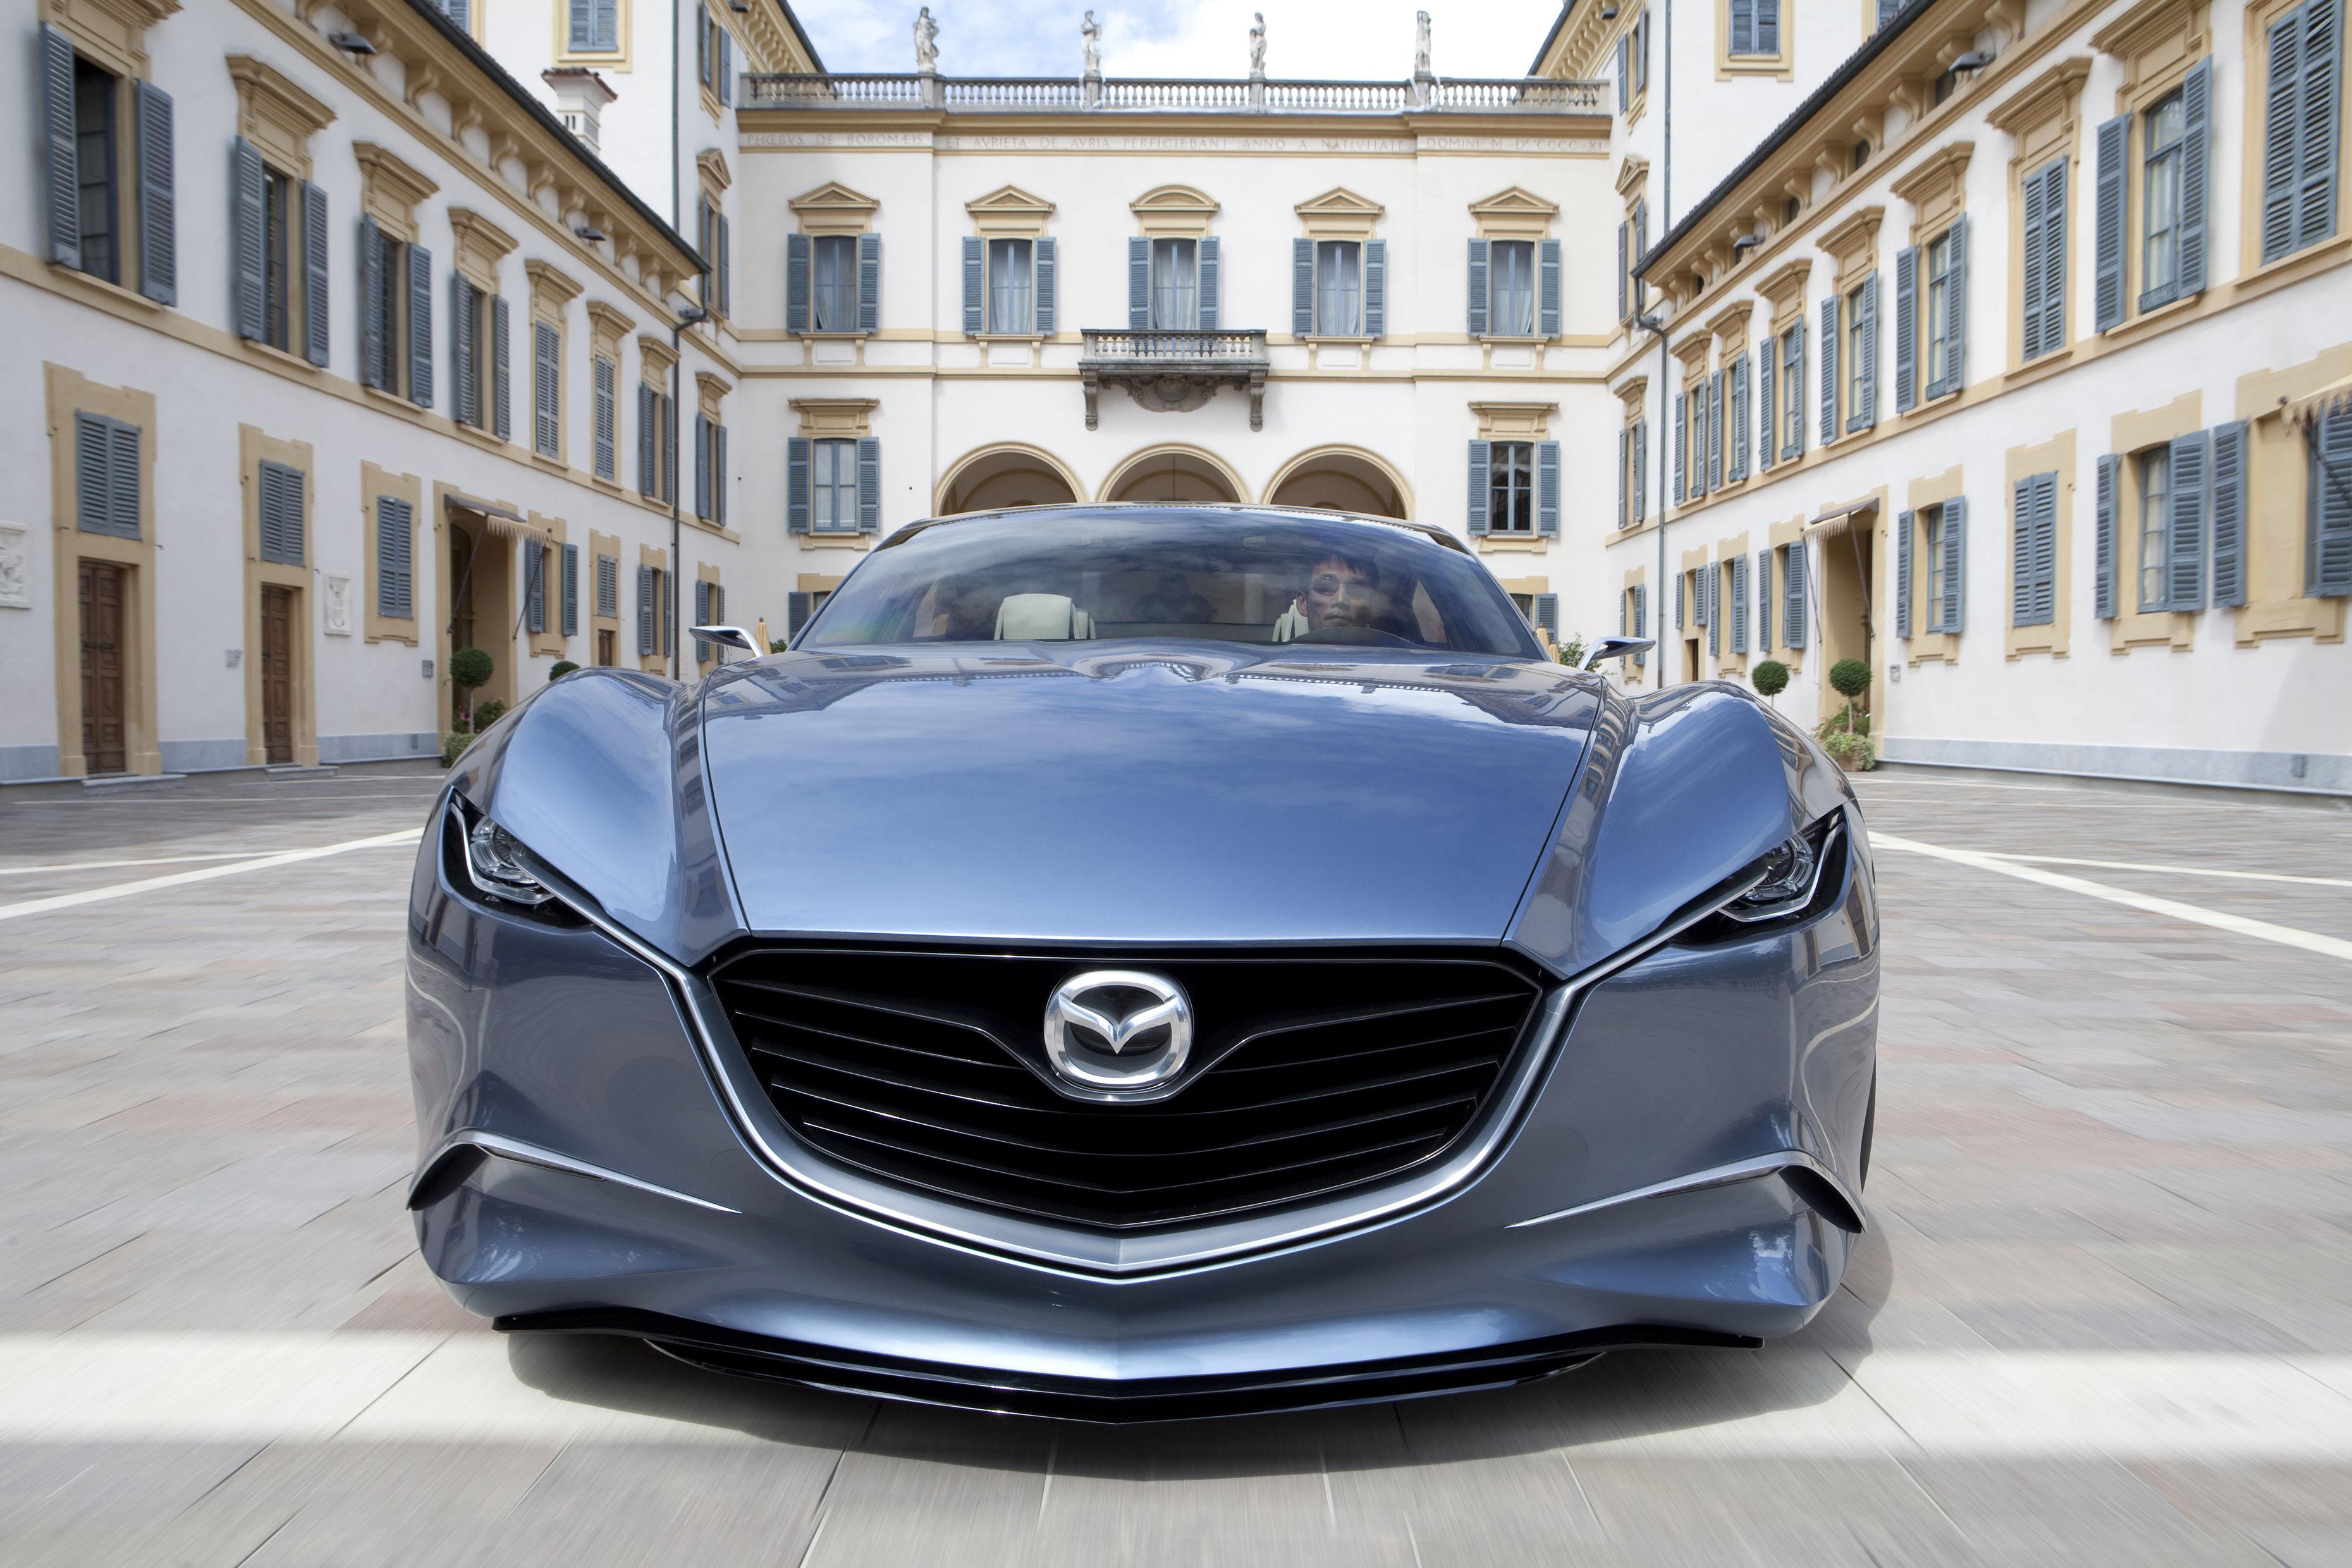 Mazda KODO - Soul of Motion | The Next Gear